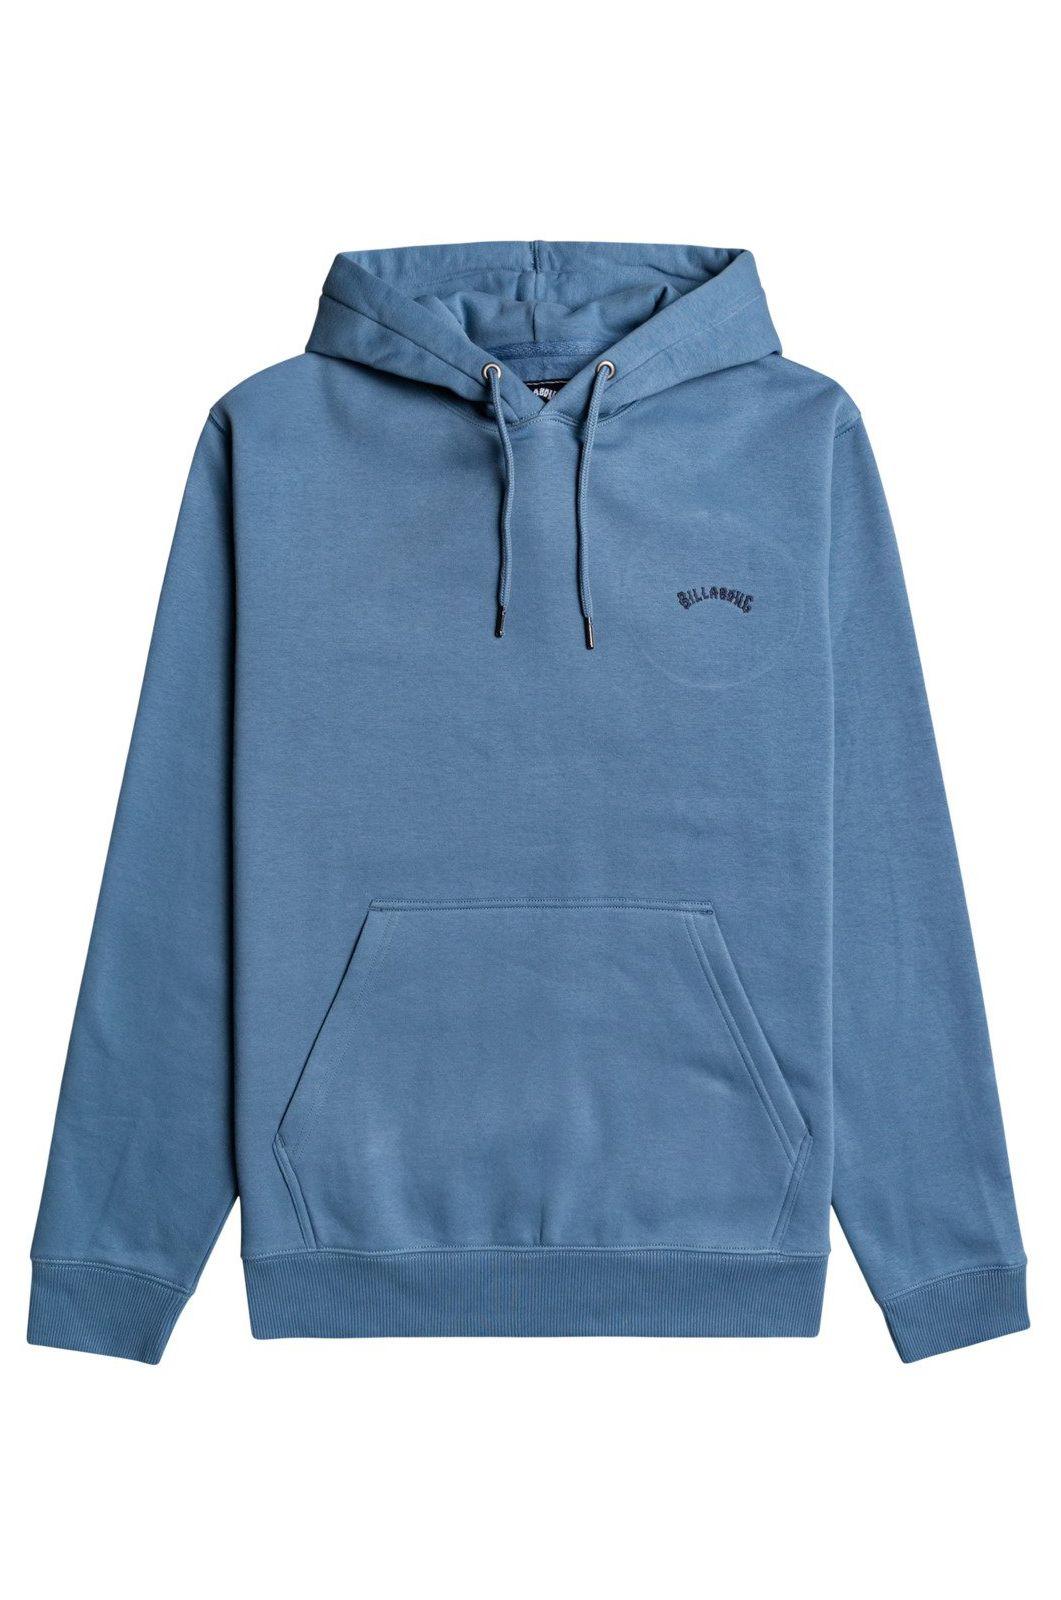 Billabong Sweat Hood ORIGINAL PO Carolina Blue